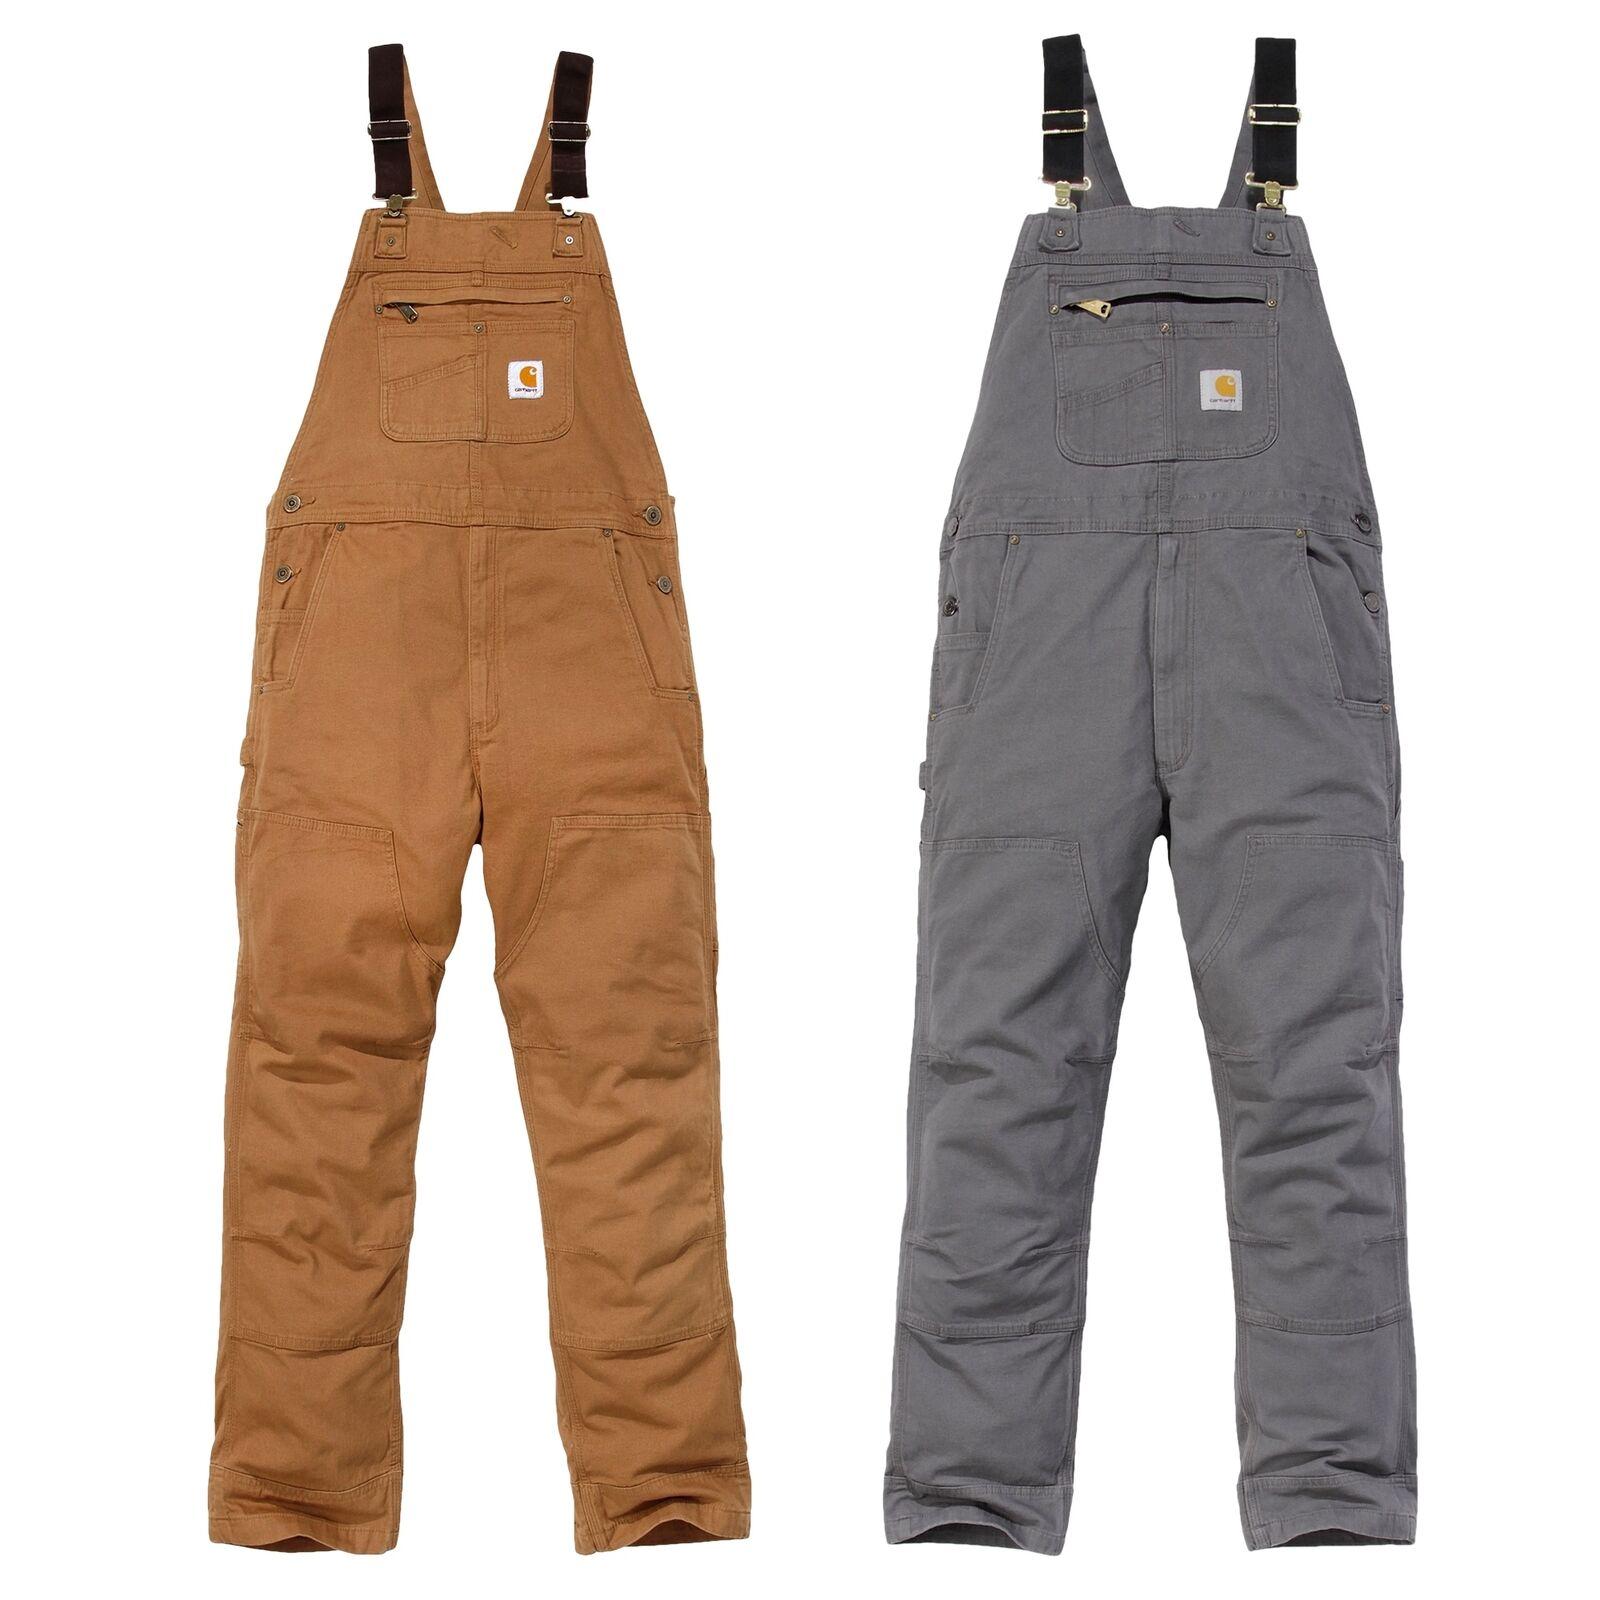 Carhartt Mens Cotton Triple Stitched Durable Bib Overalls